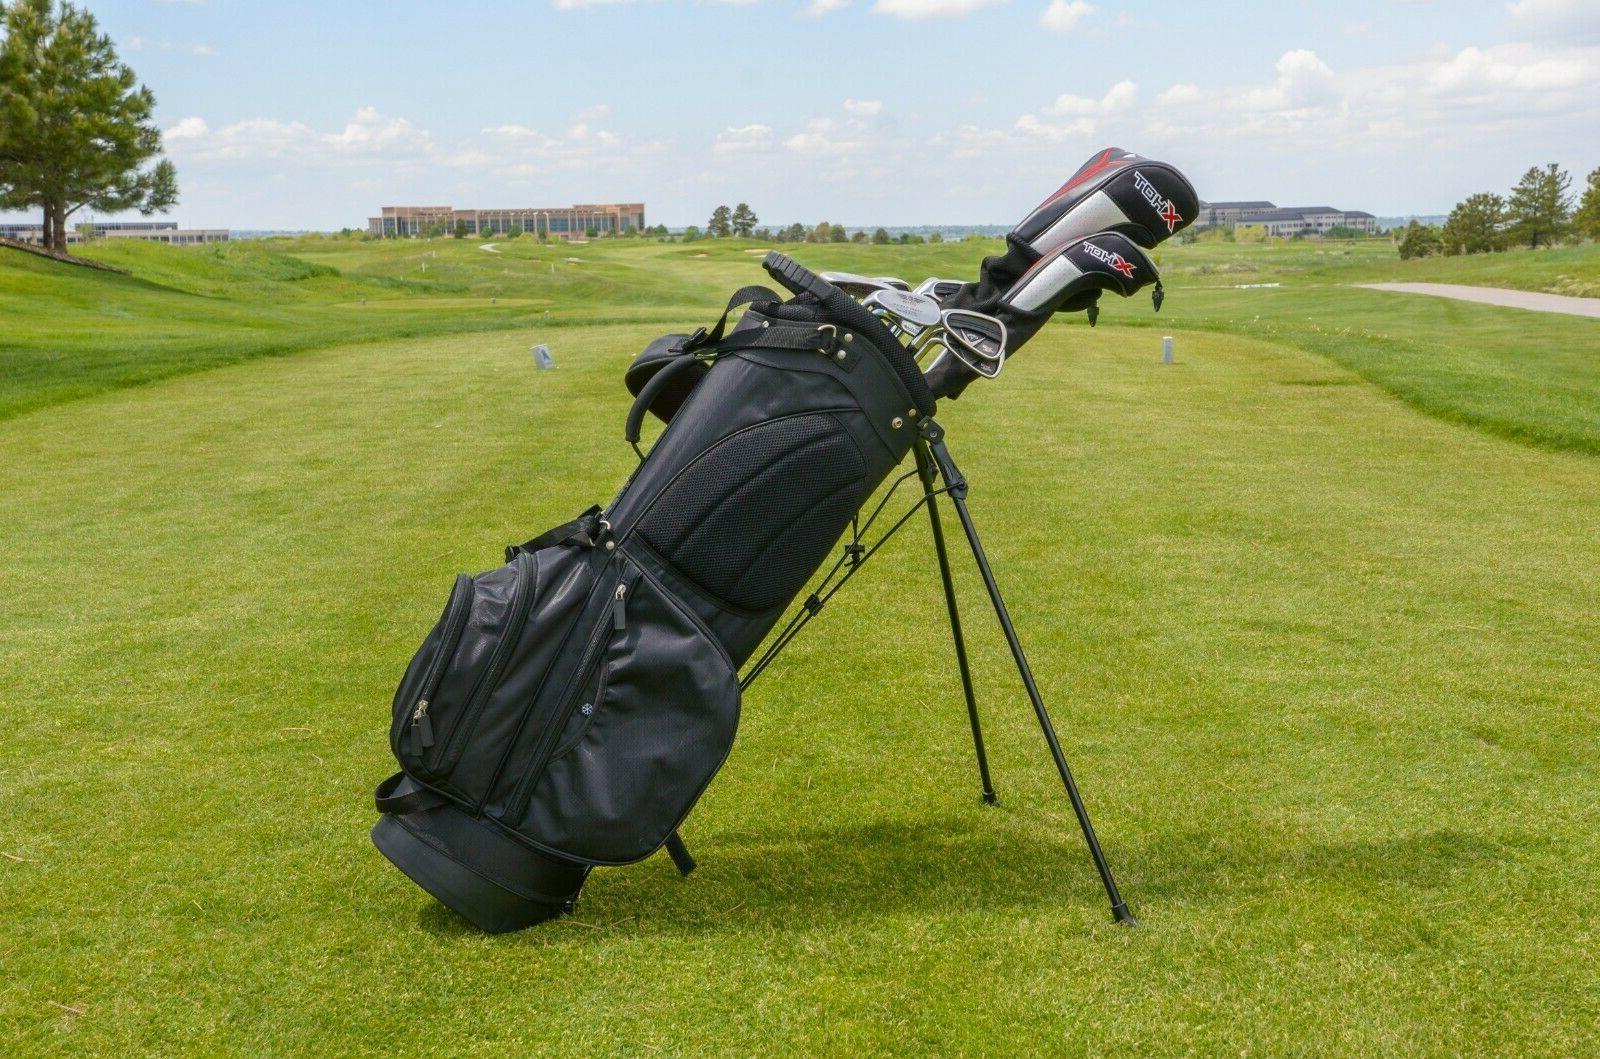 Black Stand Golf Bag